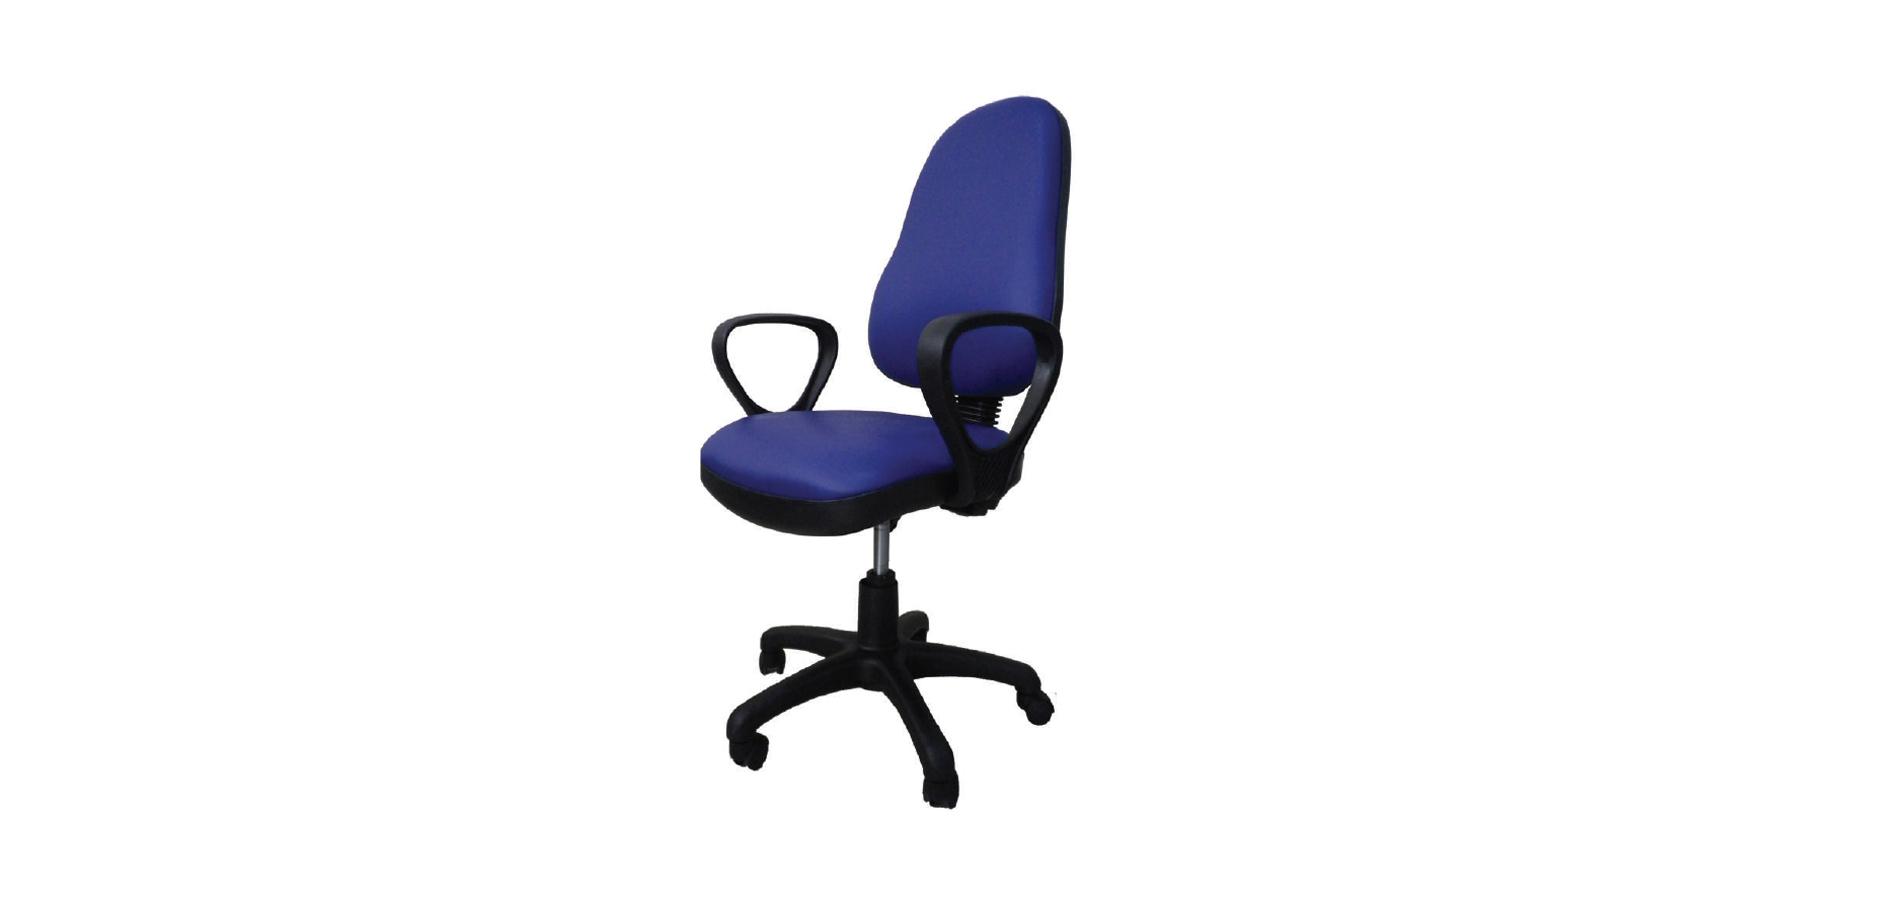 zeta desk chair little kids table and chairs office epiplo fwtistiko mixalopoylos sku 3823